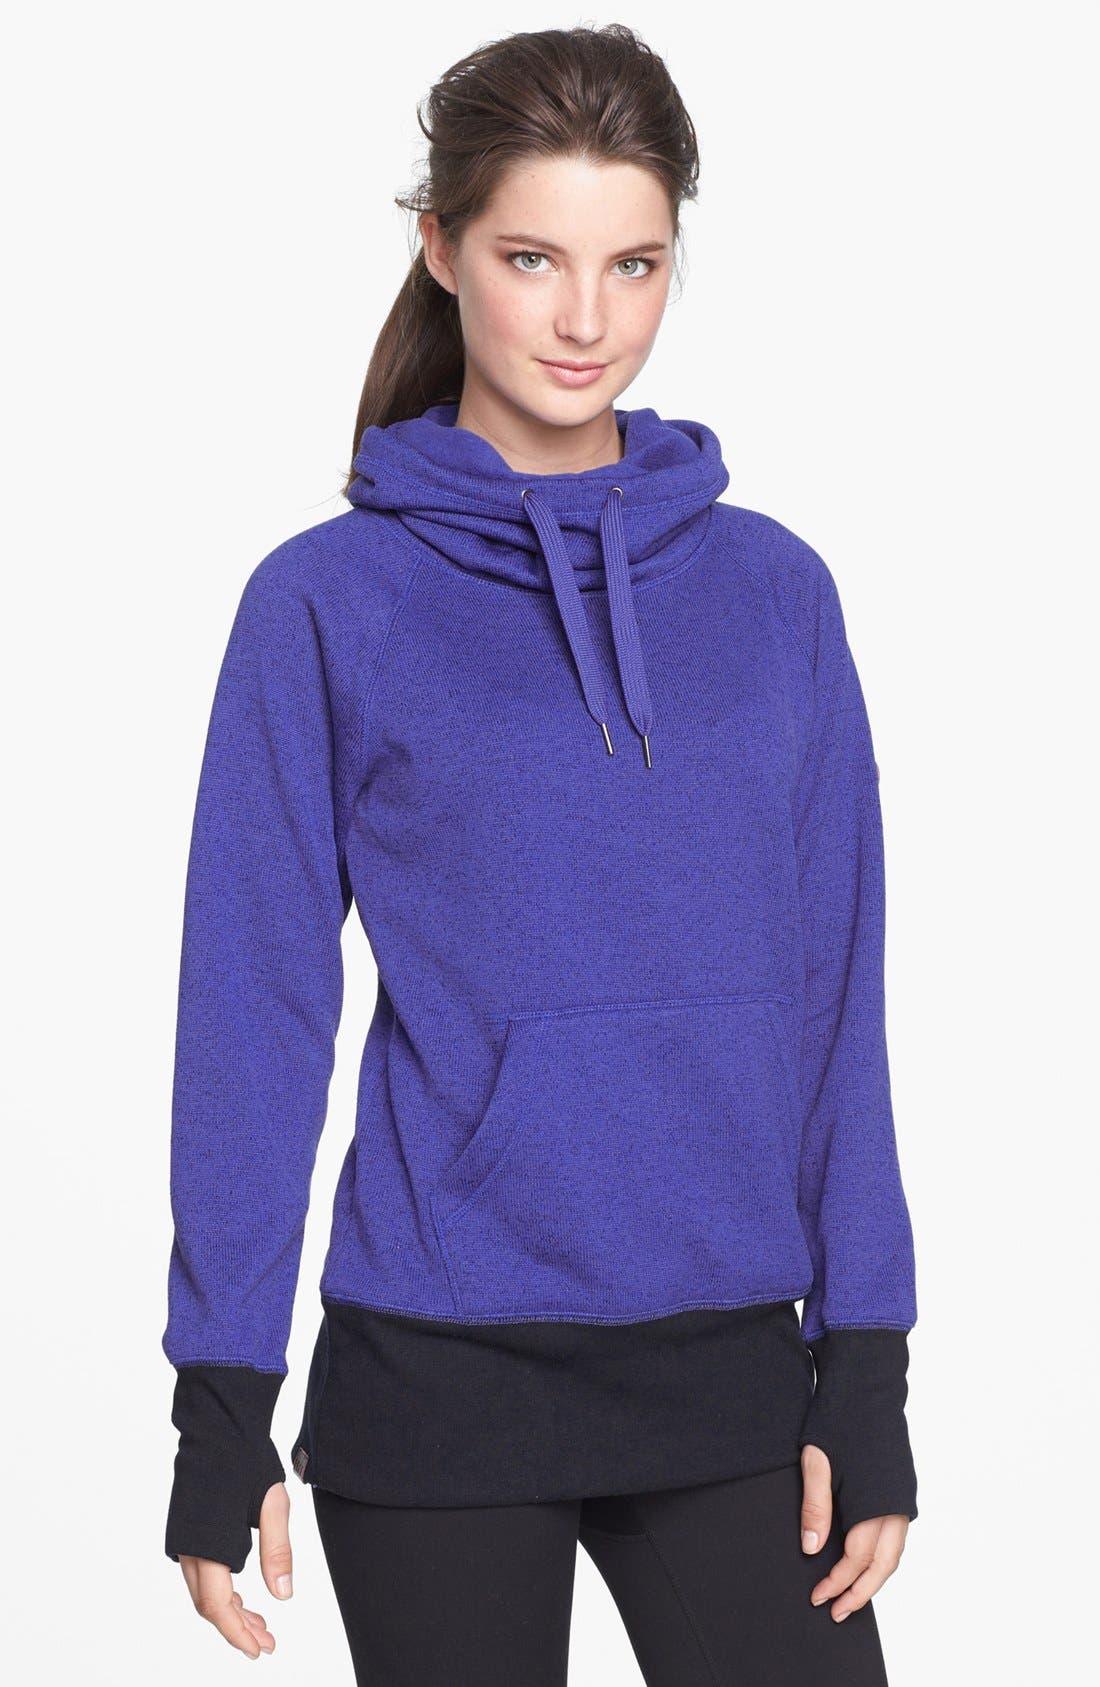 Main Image - Roxy 'Switch It Up' Fleece Jacket